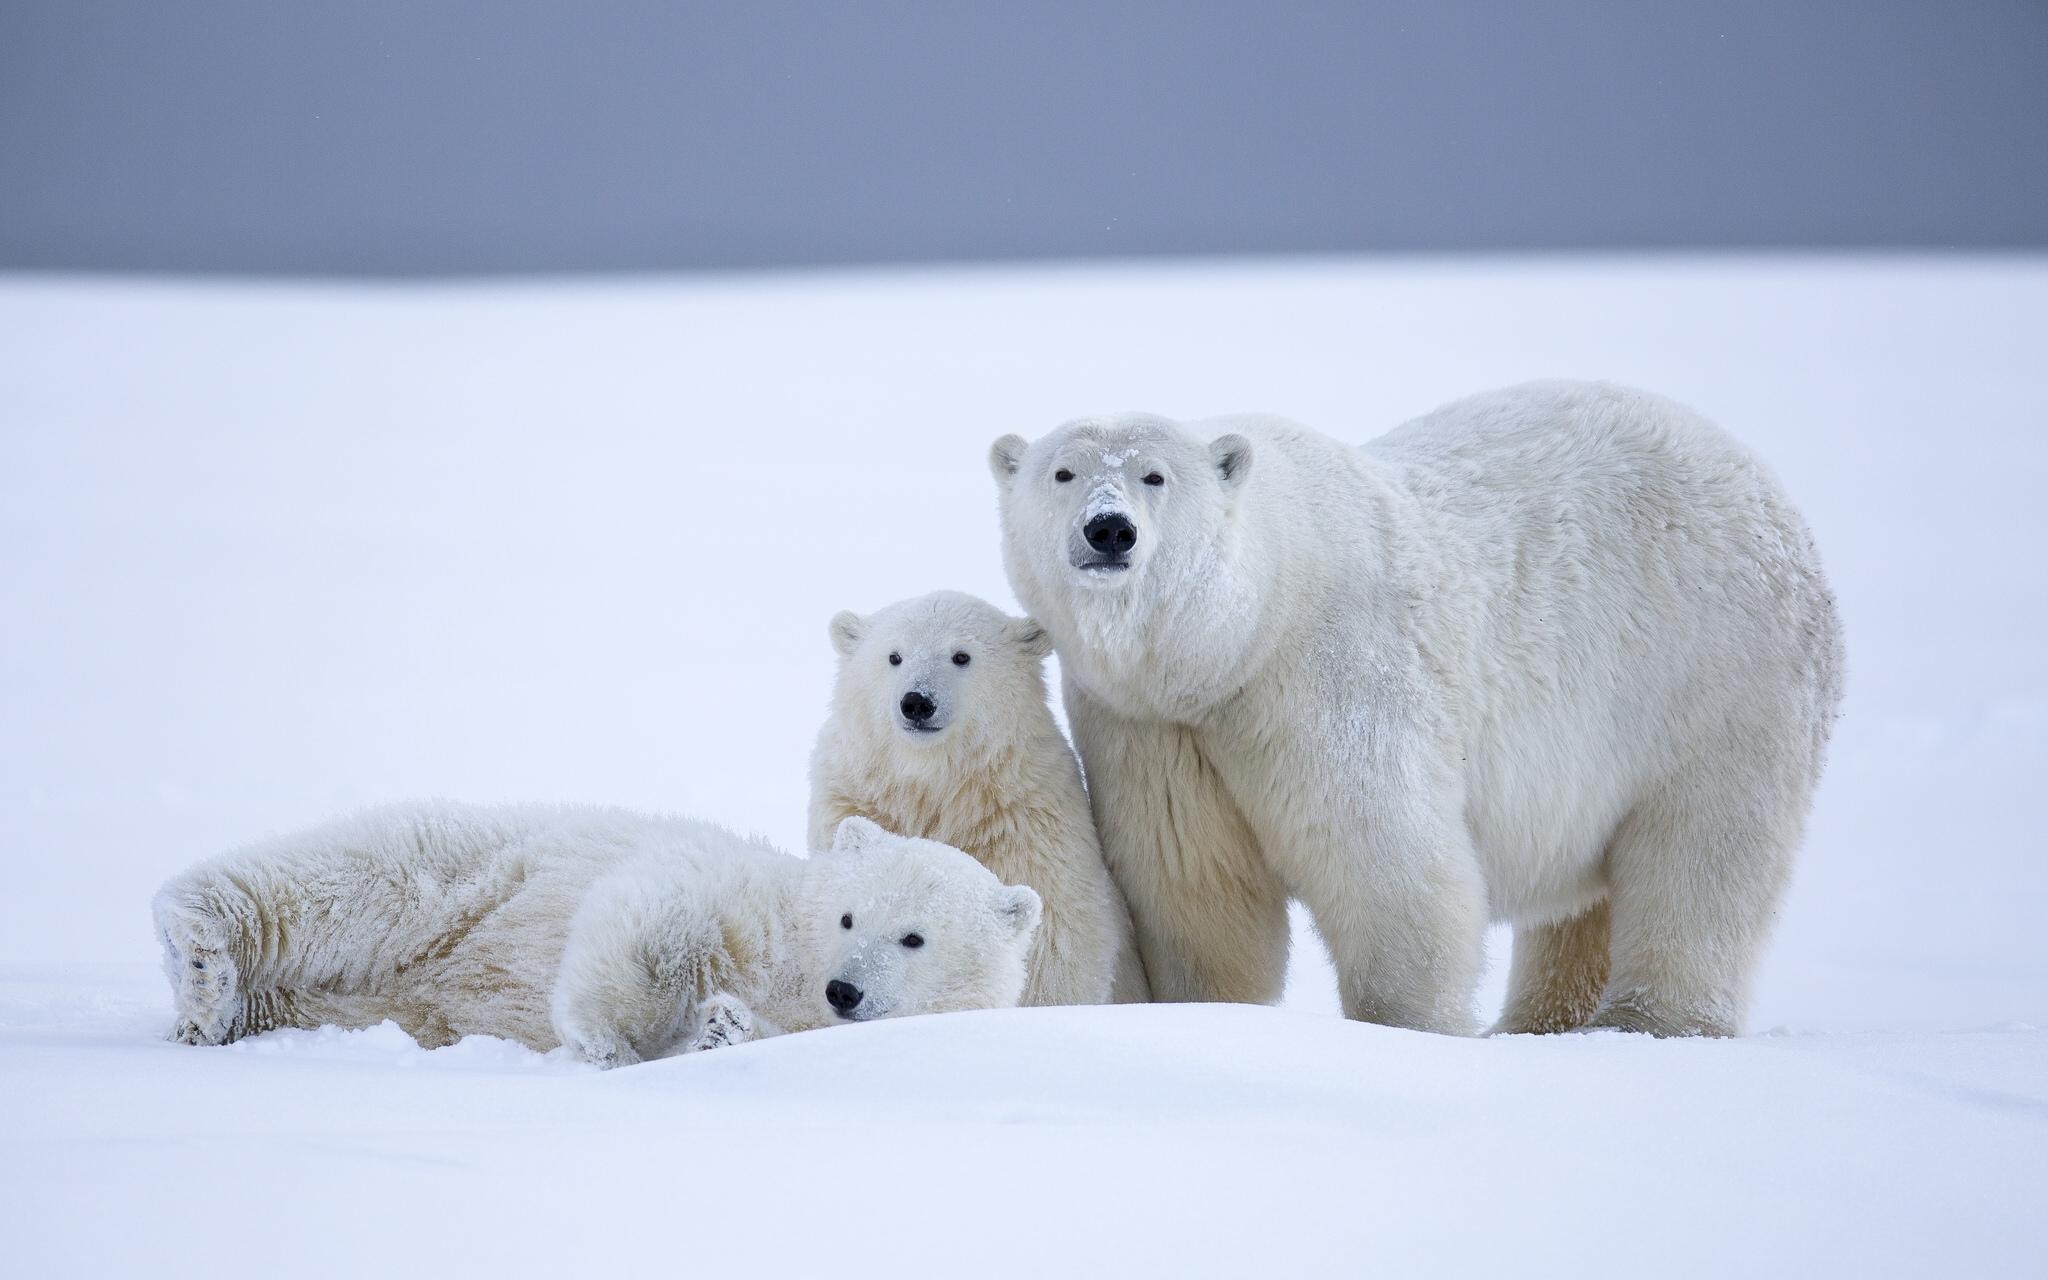 polar bear hd wallpaper background image 2048x1280. Black Bedroom Furniture Sets. Home Design Ideas